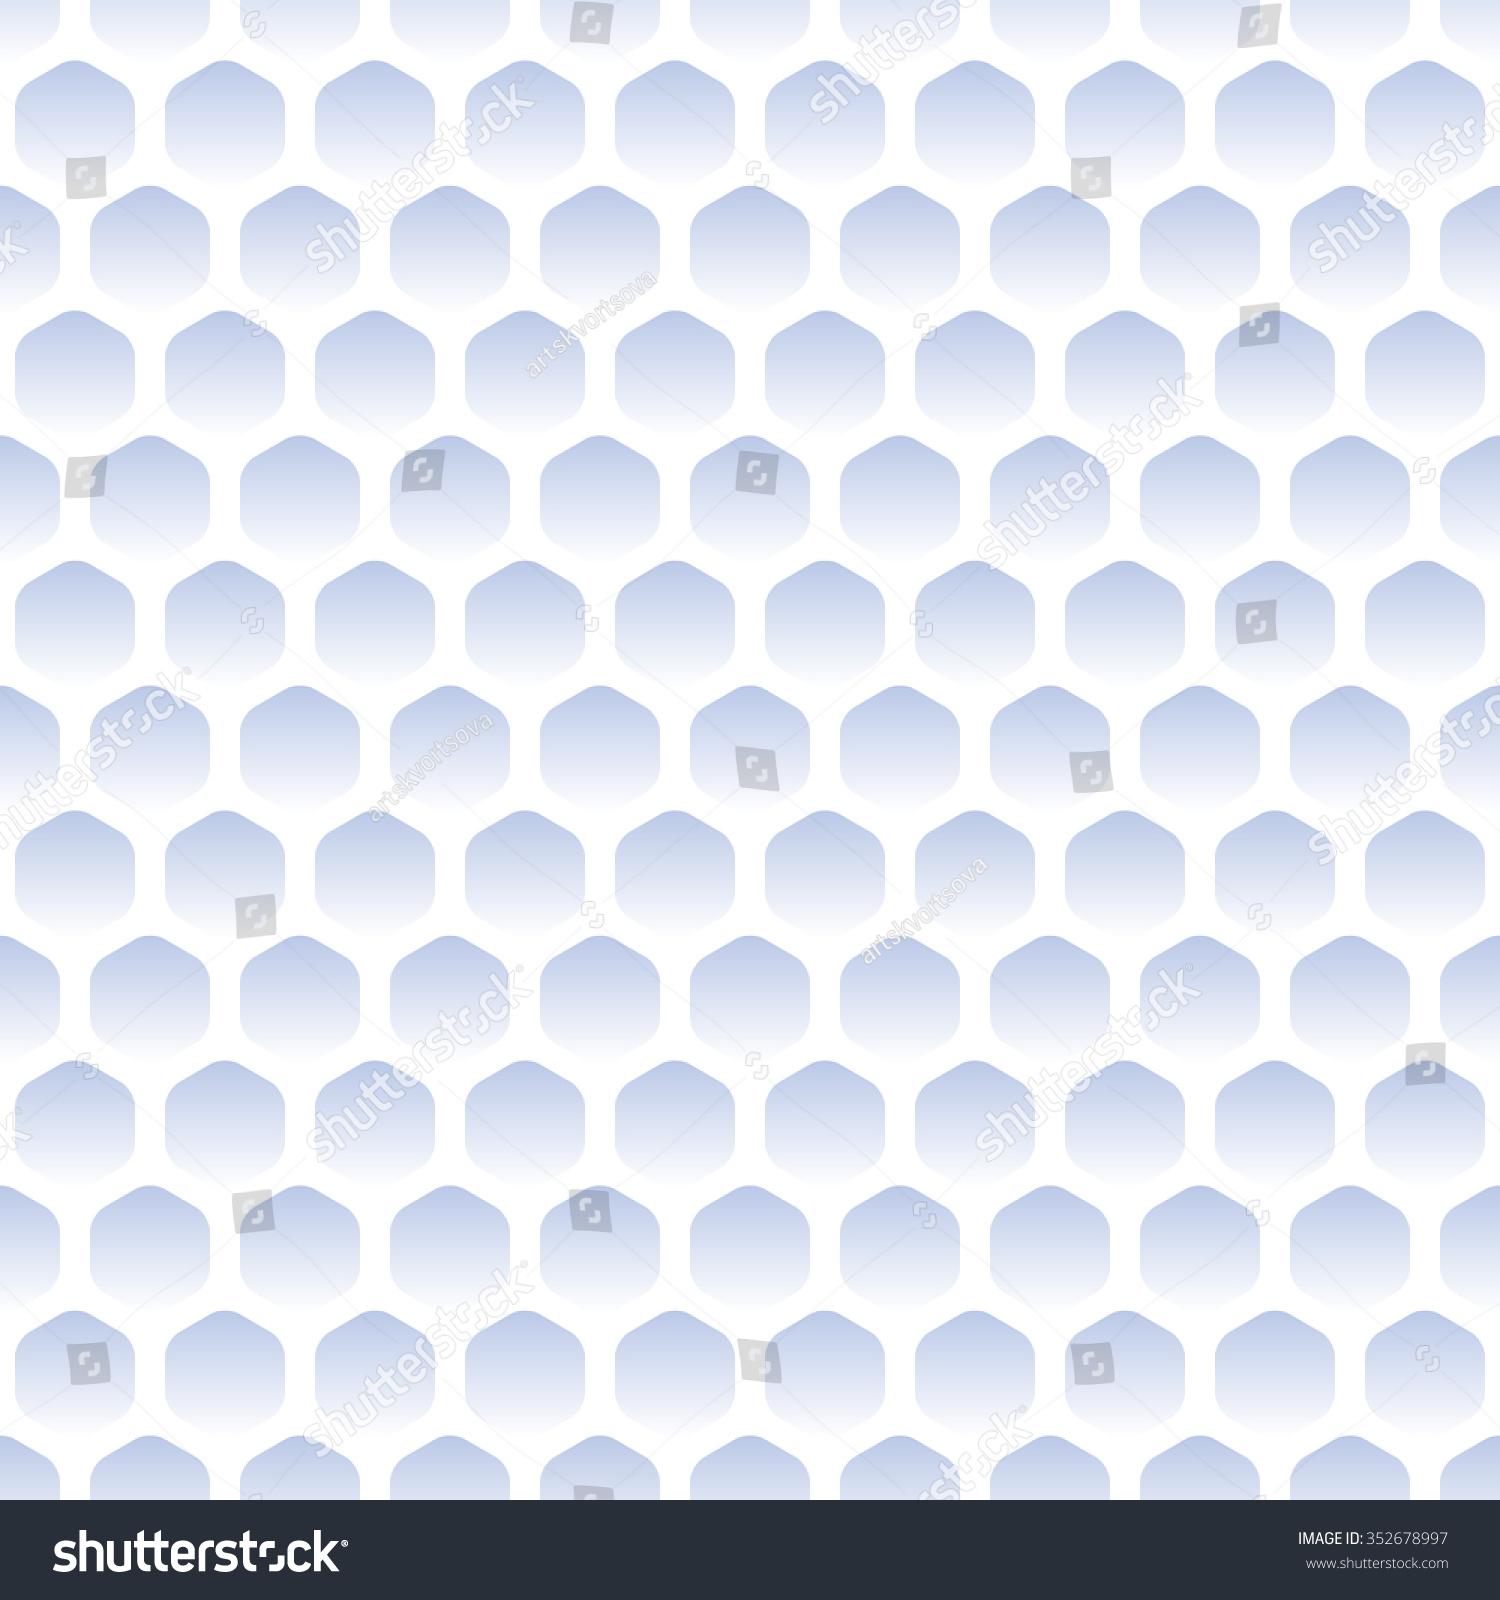 seamless golf pattern background realistic golf ball